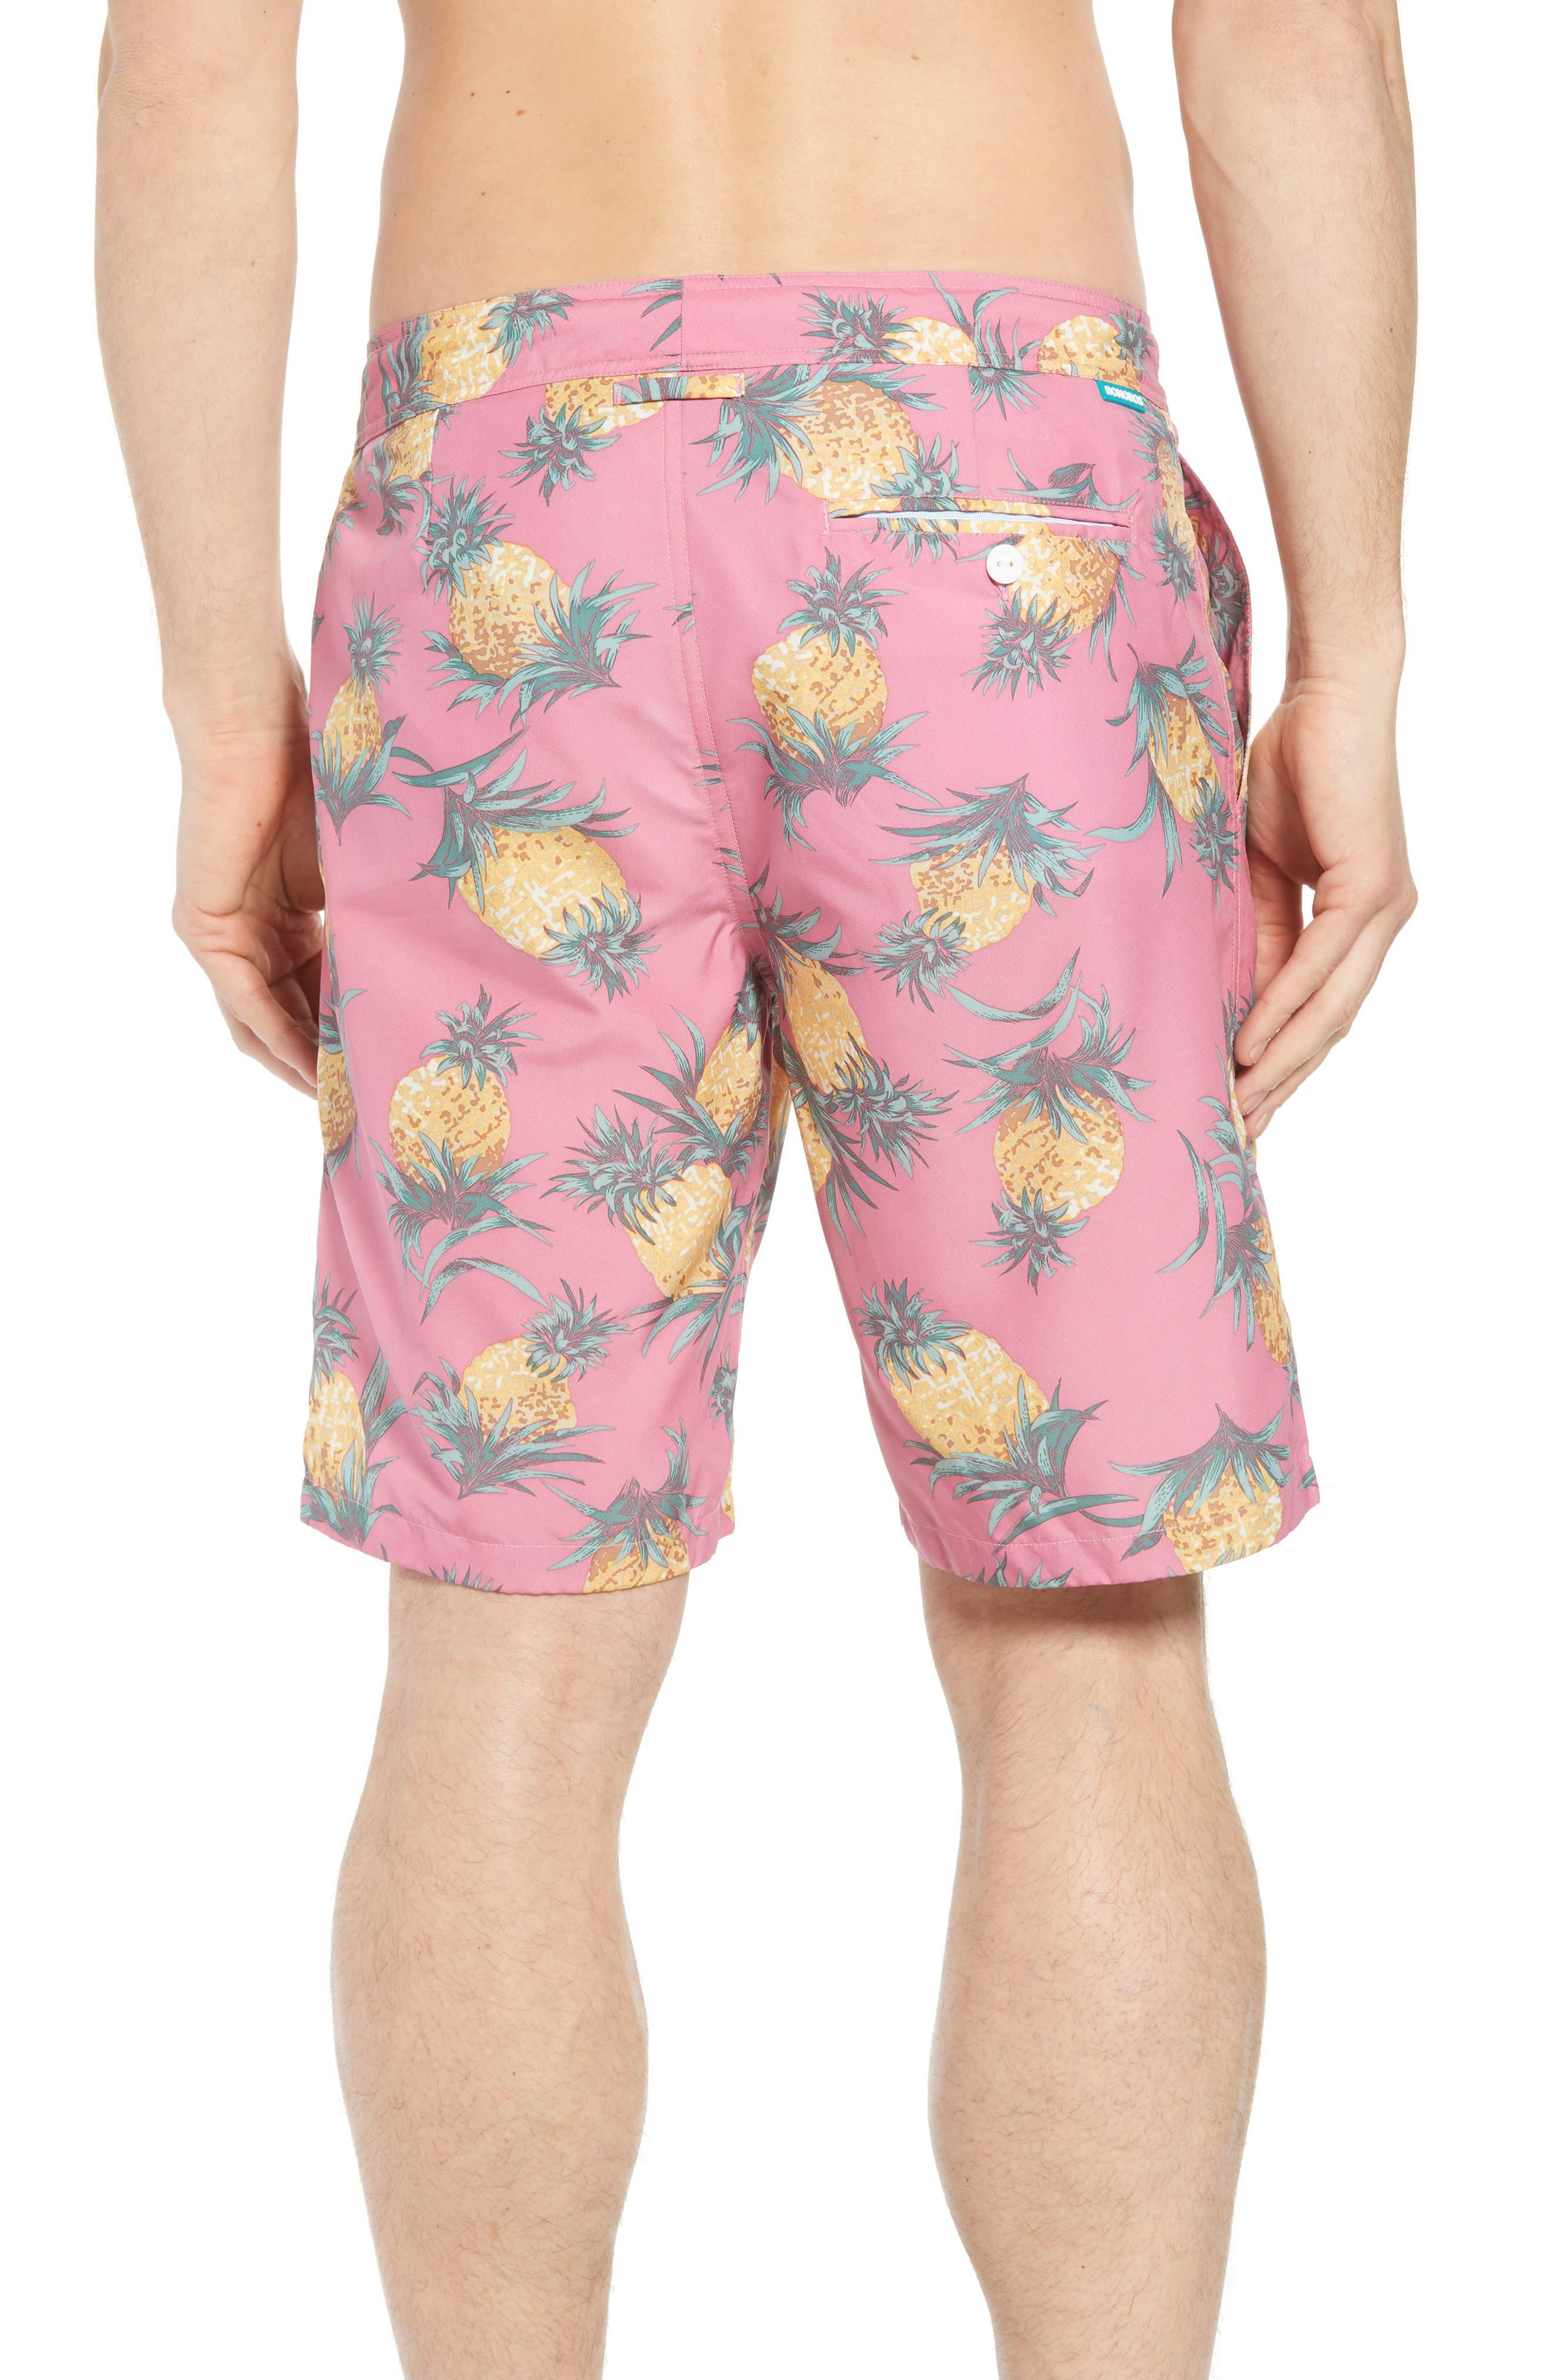 Banzai 9-Inch Swim Trunks,                             Alternate thumbnail 2, color,                             Pineapples Print